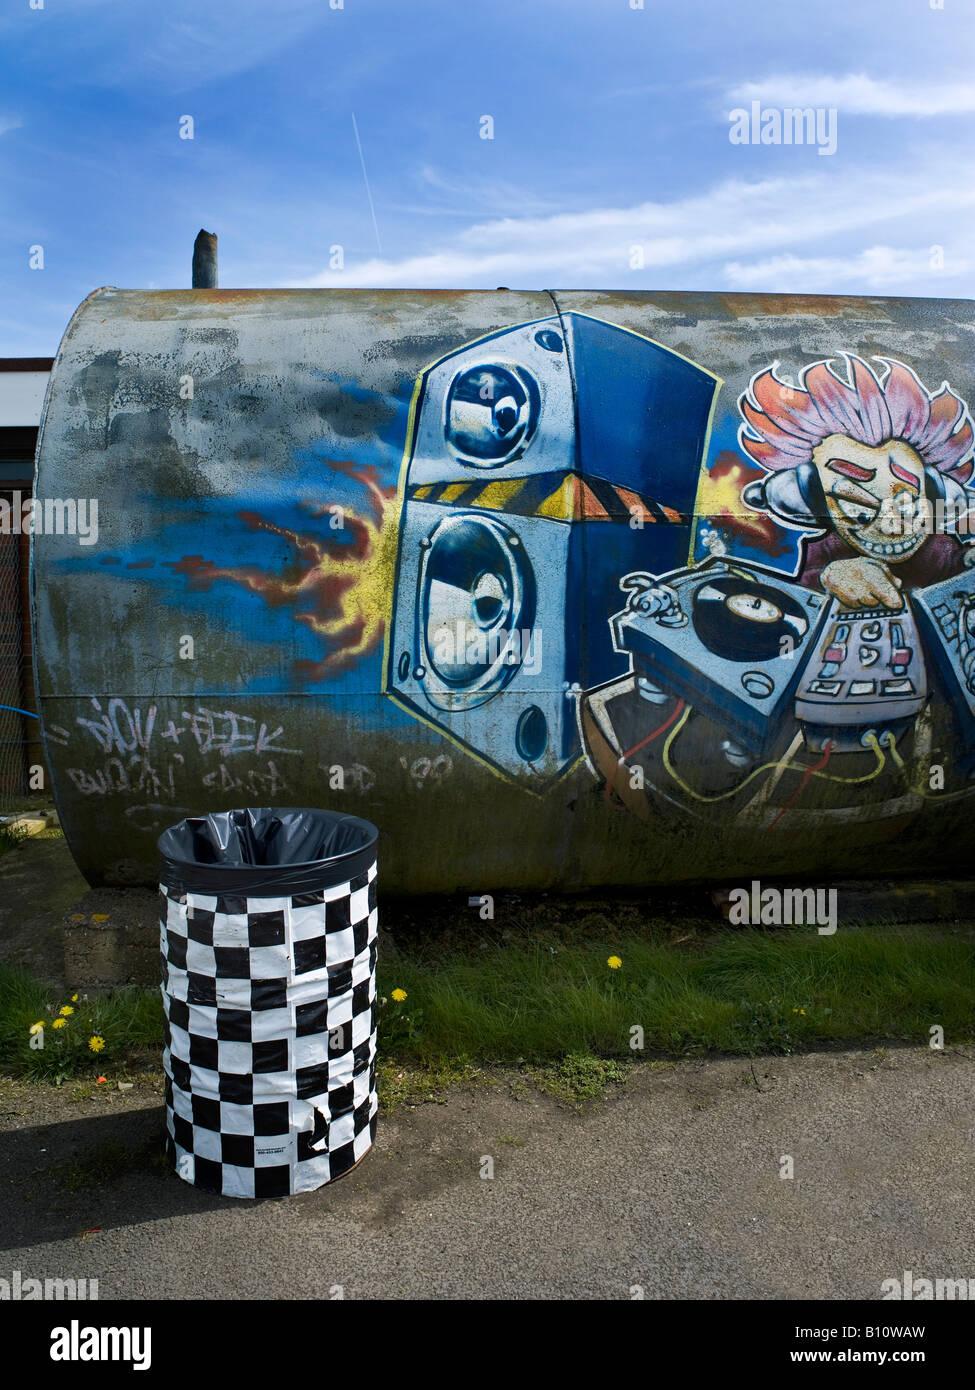 Graffiti DJ Decks Art Urban Street Hip Hop Paint Grime Music Vibe